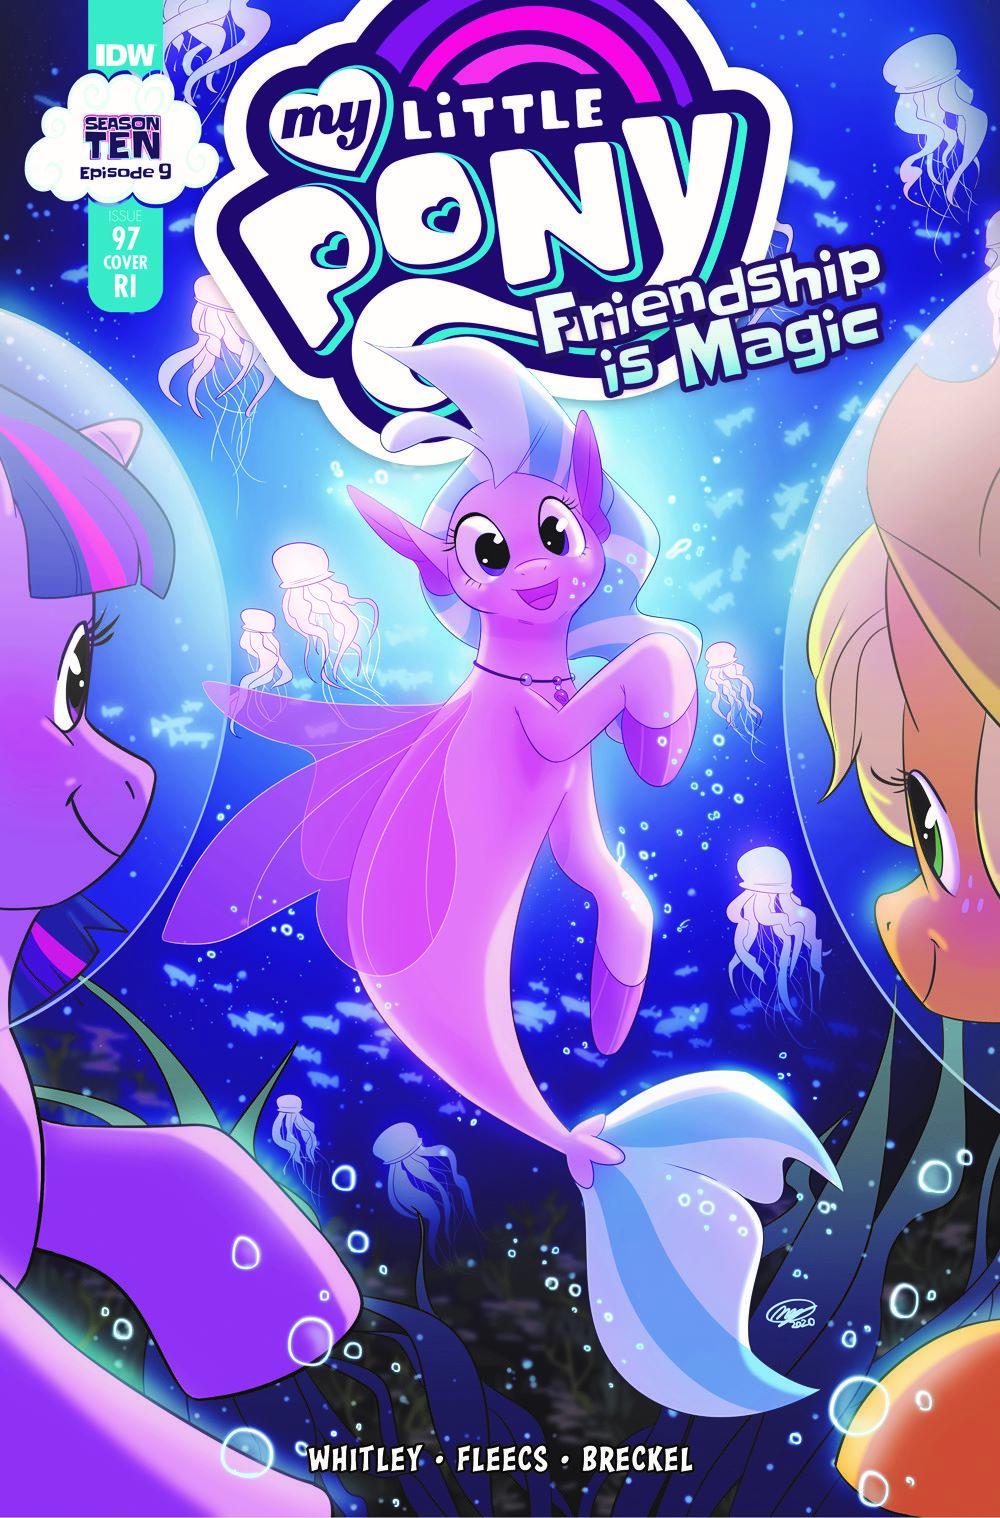 MLP97_09-coverRI ComicList Previews: MY LITTLE PONY FRIENDSHIP IS MAGIC #97